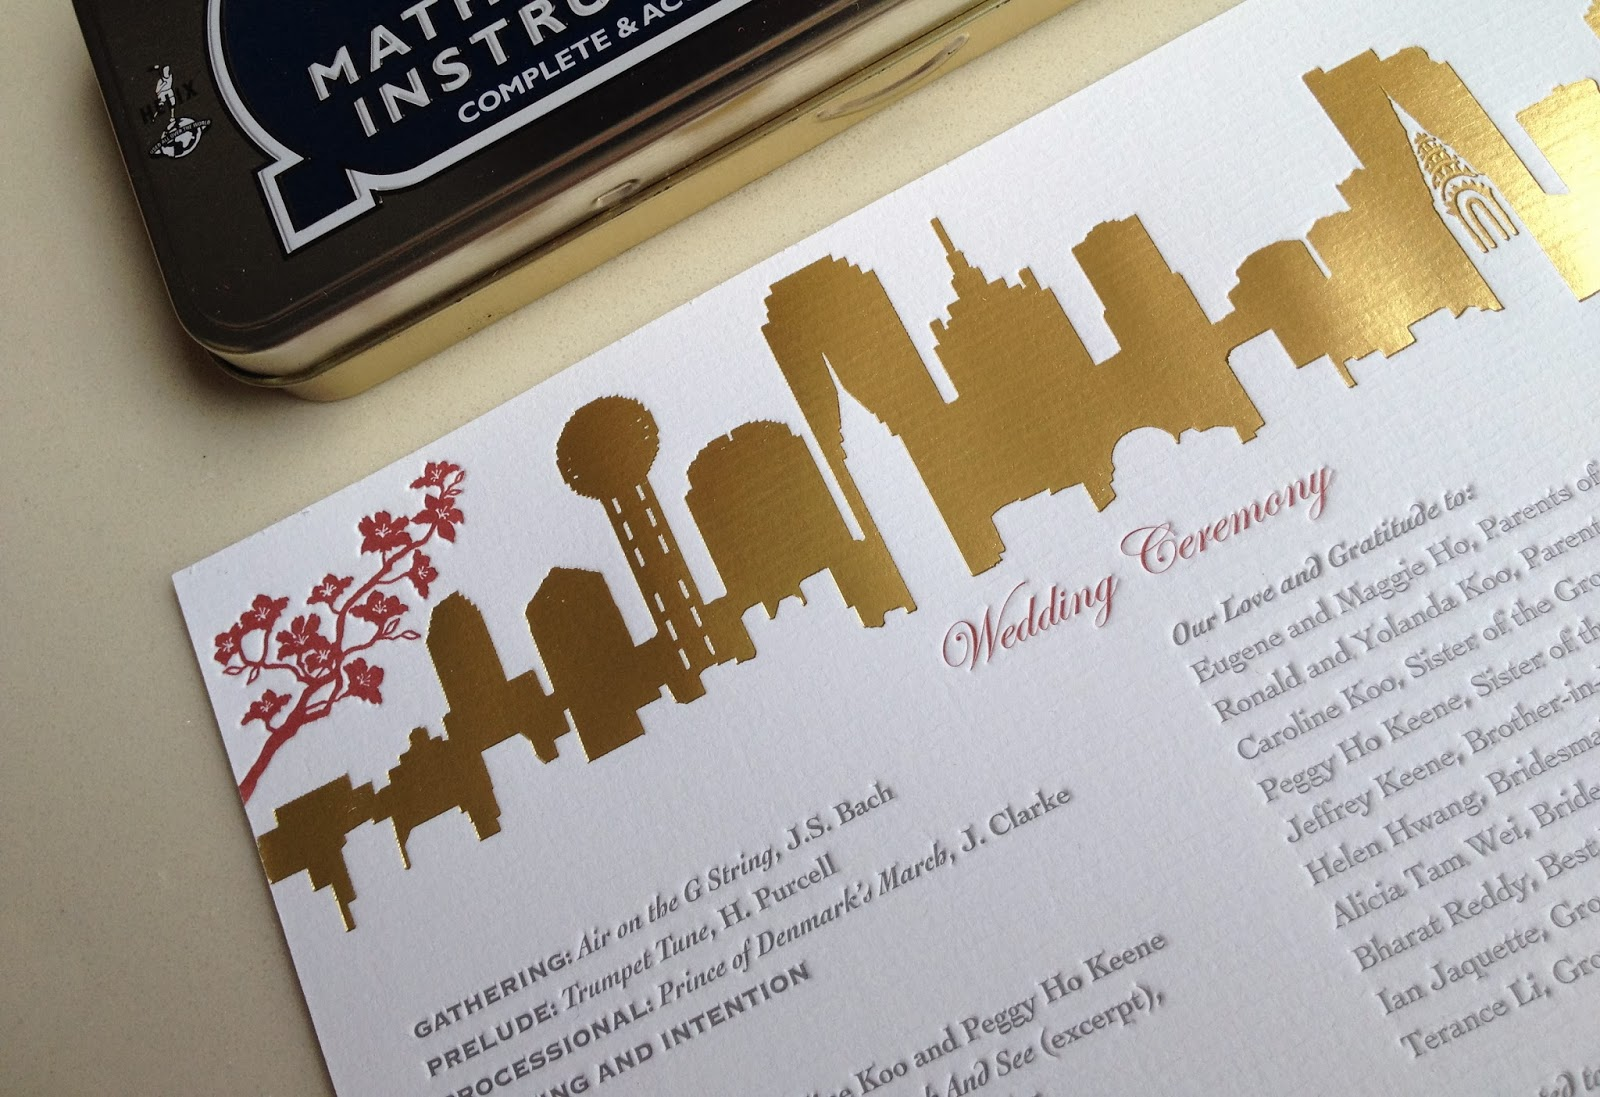 Kalo make art bespoke wedding invitation designs skyline lover kalo make art bespoke wedding invitation designs skyline lover new york and dallas for hong kong couple in house wedding invitation design stopboris Choice Image